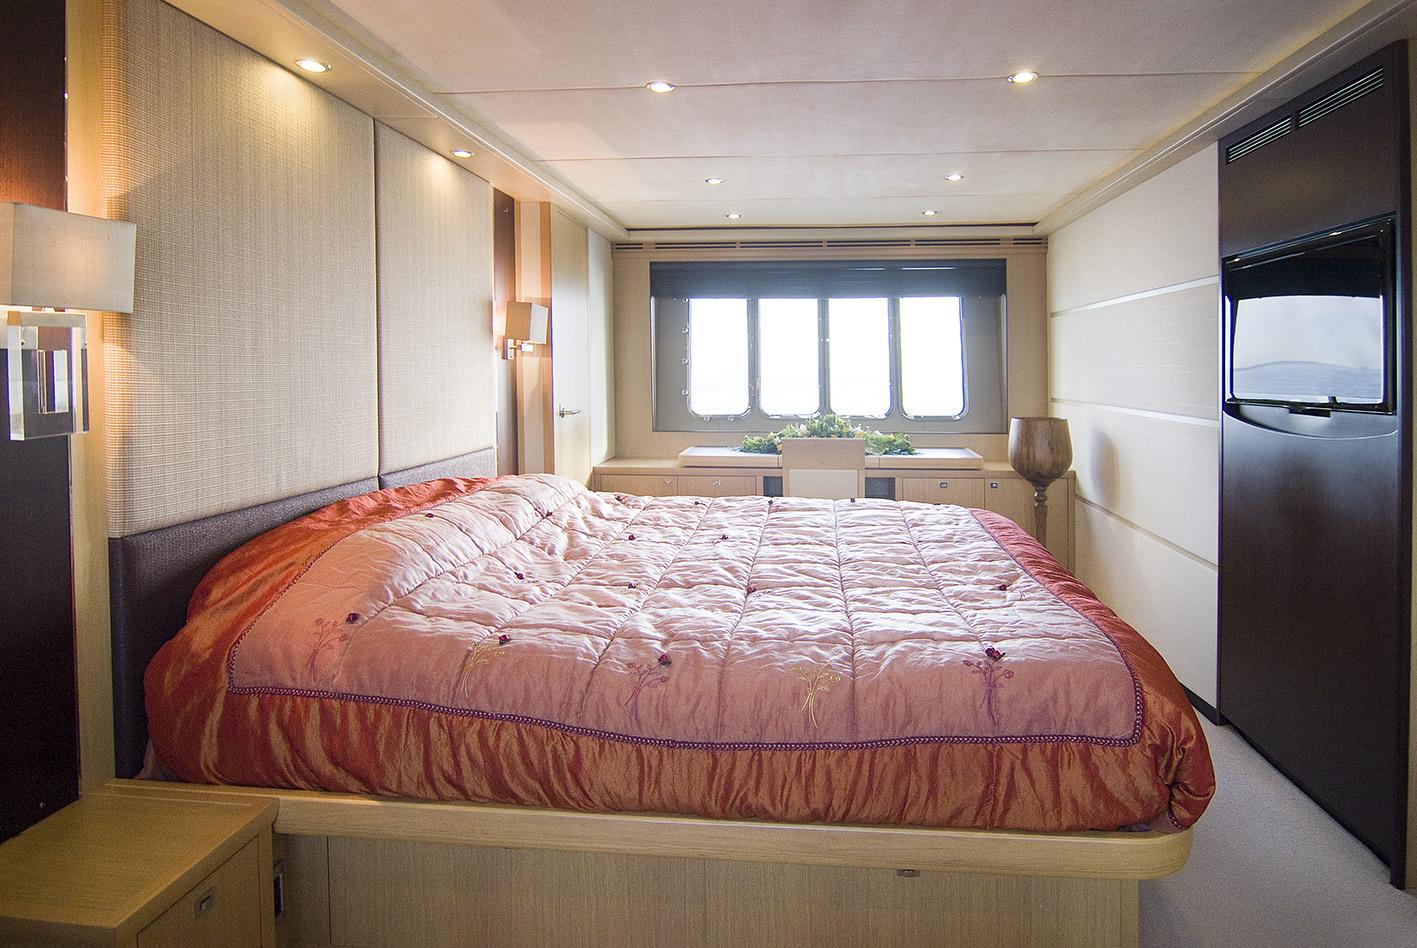 CATHERINE - Master suite